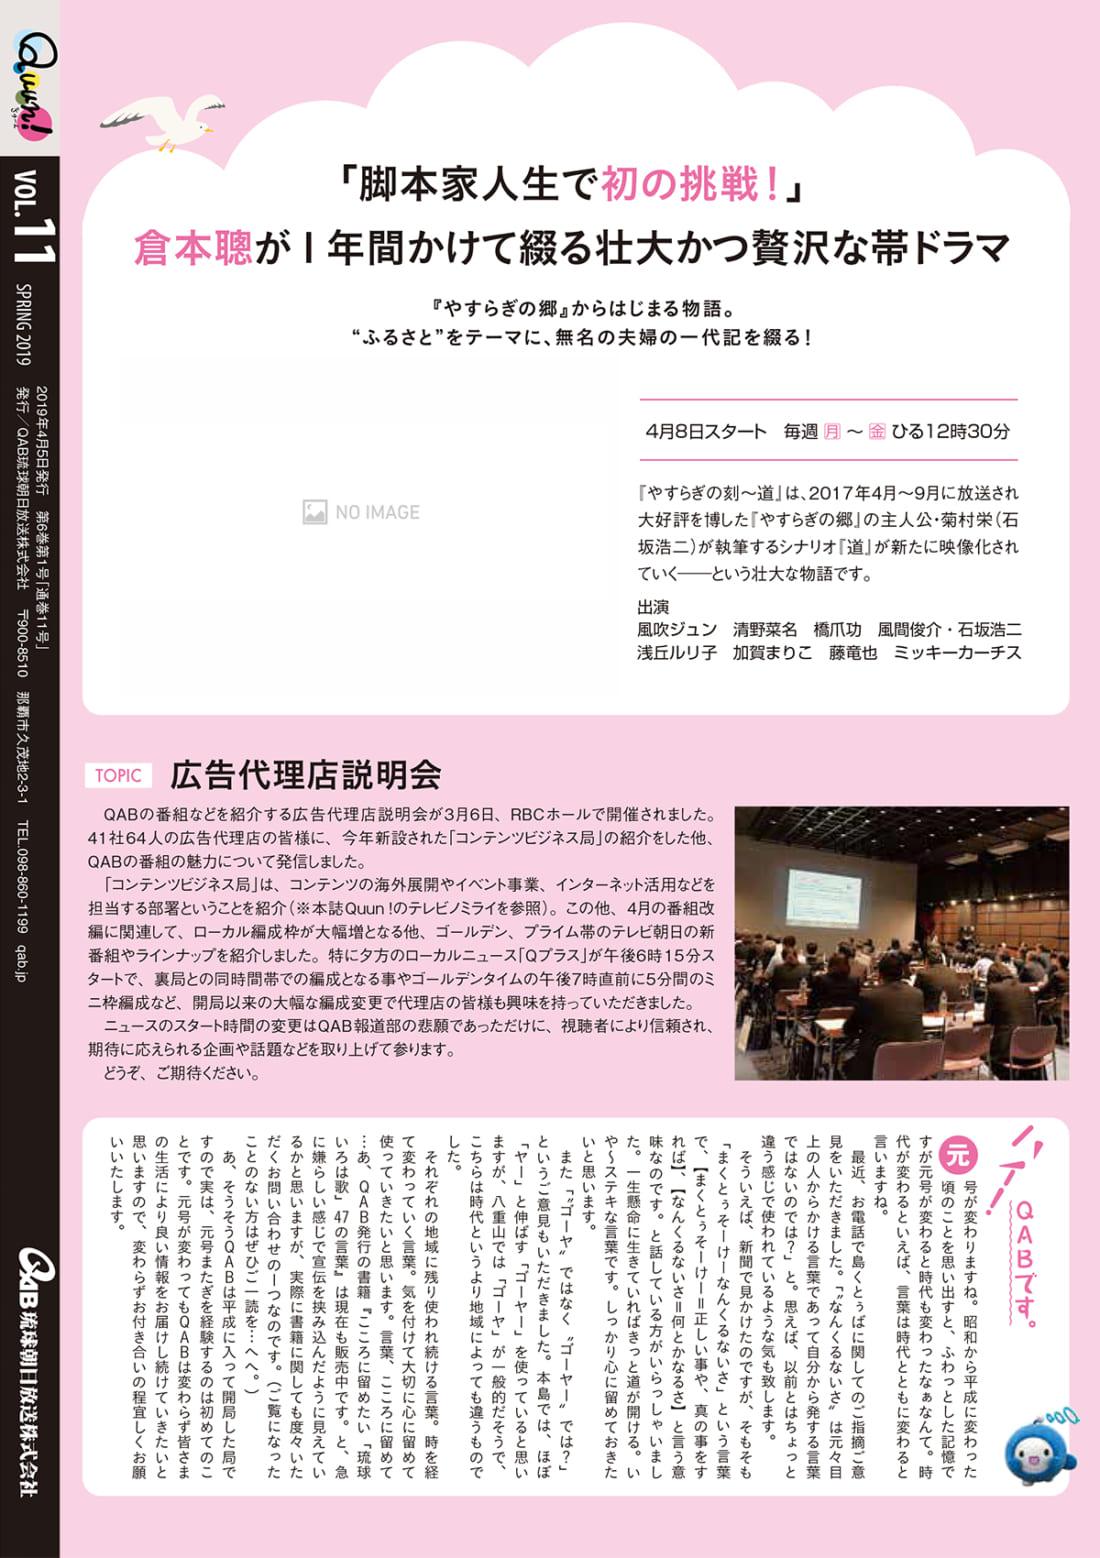 https://www.qab.co.jp/qgoro/wp-content/uploads/quun_1116-1100x1558.jpg